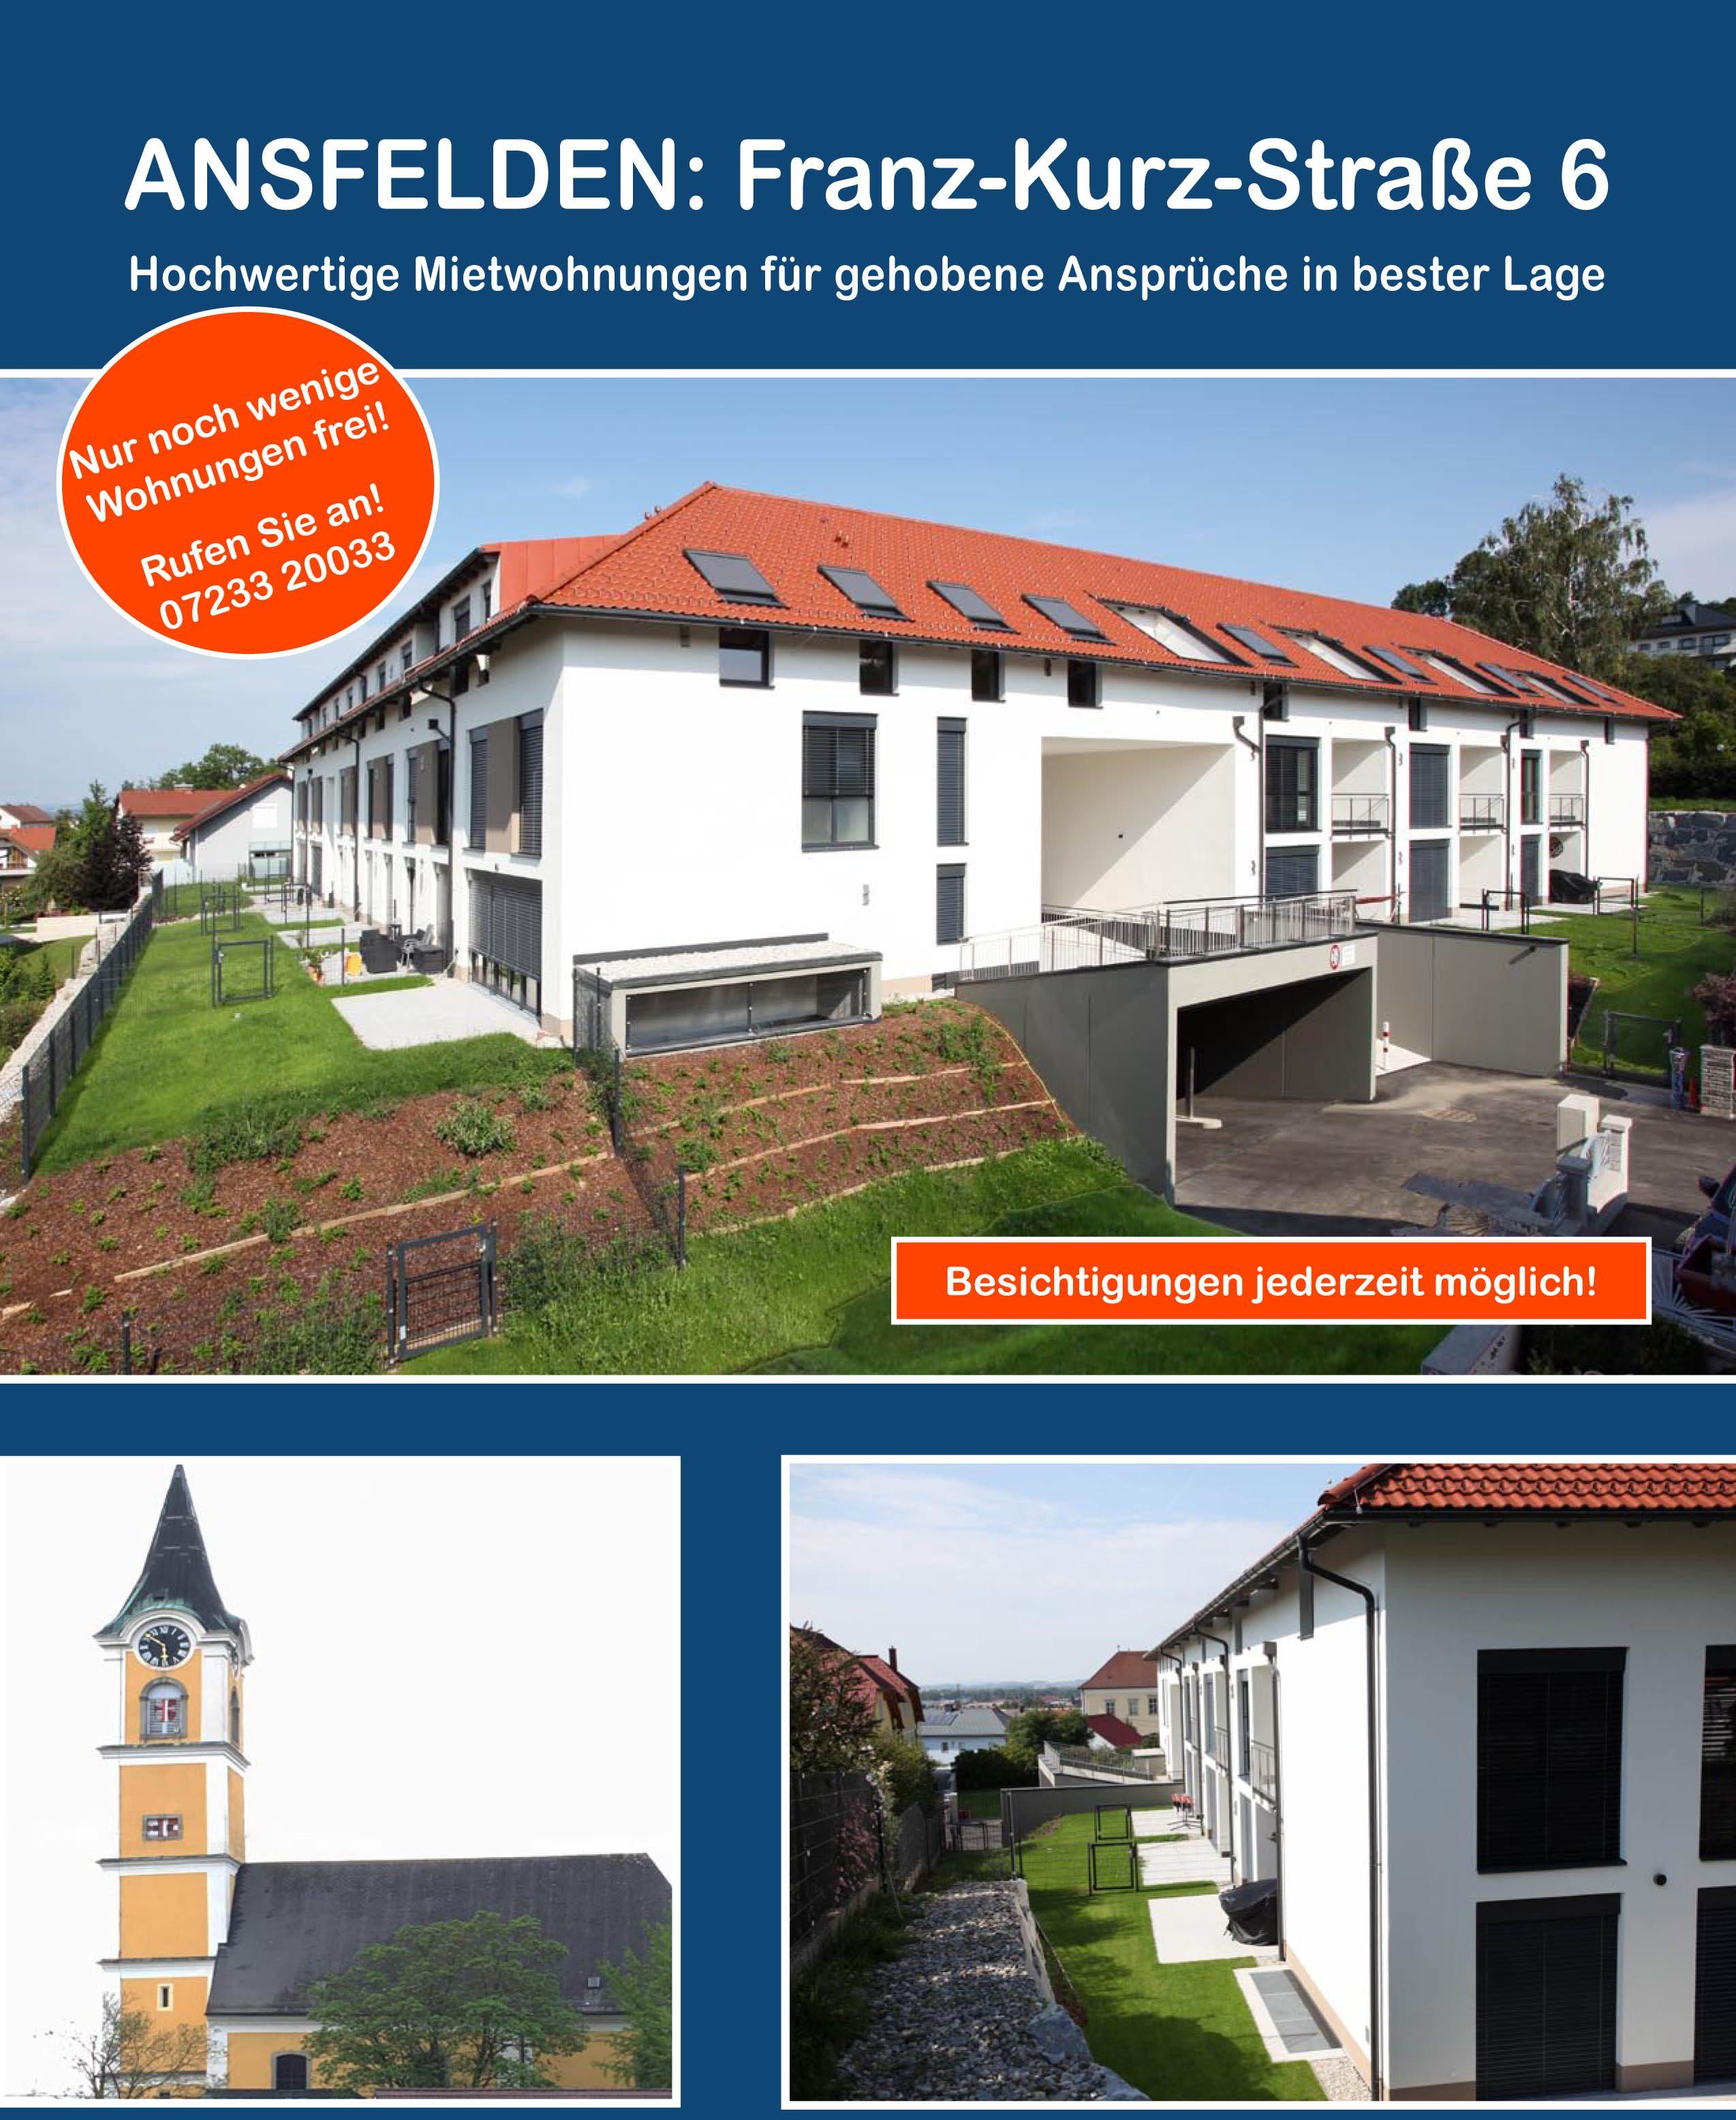 Wohnanlage Ansfelden Anton-Bruckner-Hof